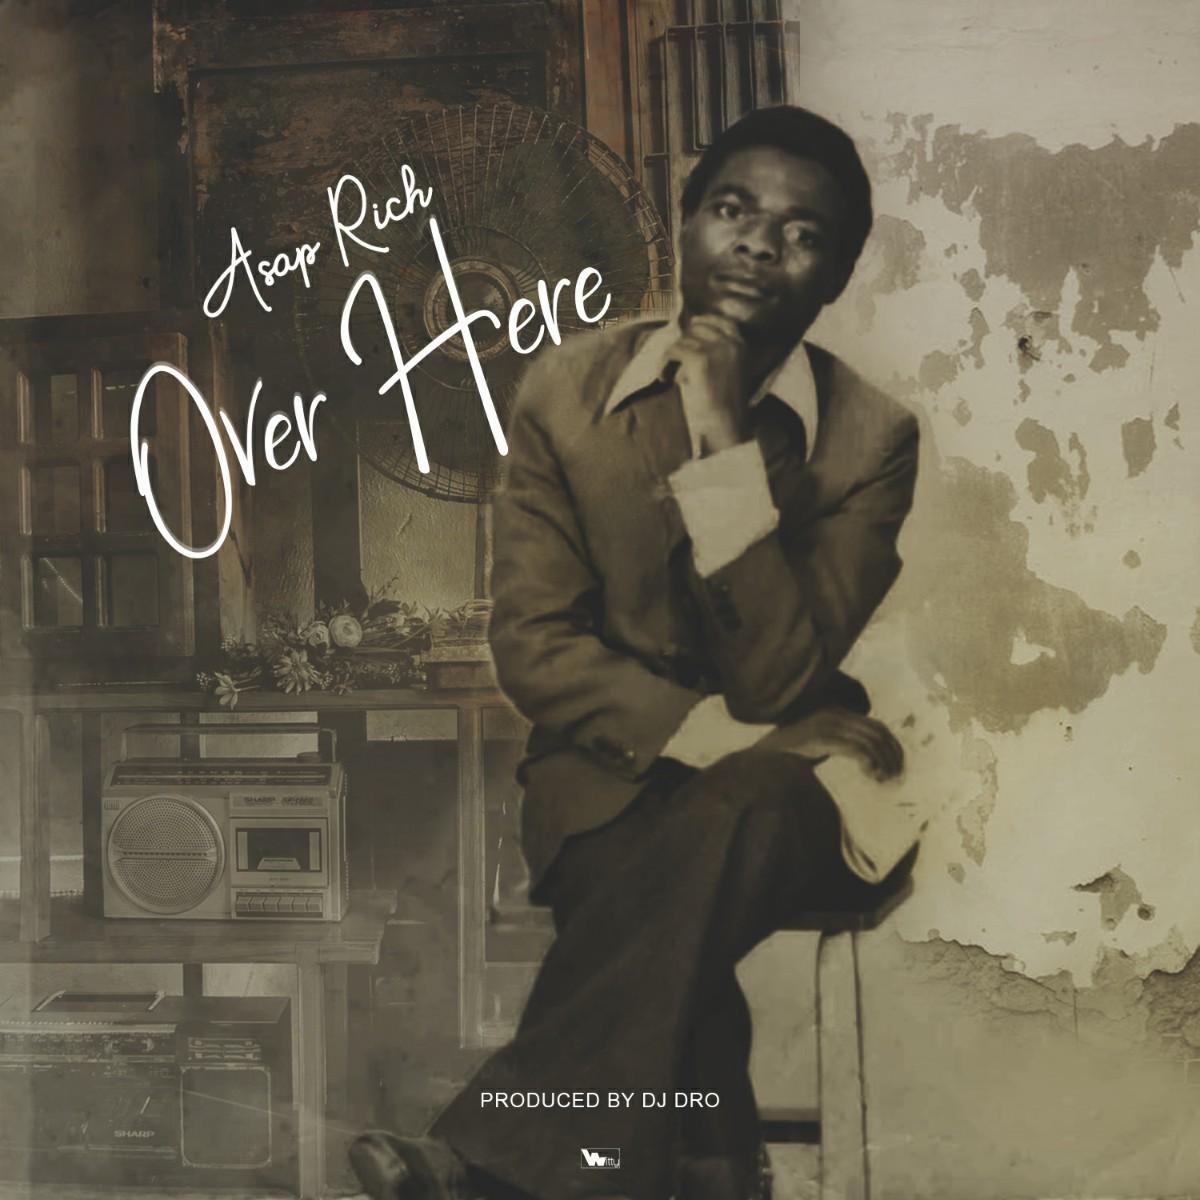 Asap Rich - Over Here (Prod. DJ Dro)